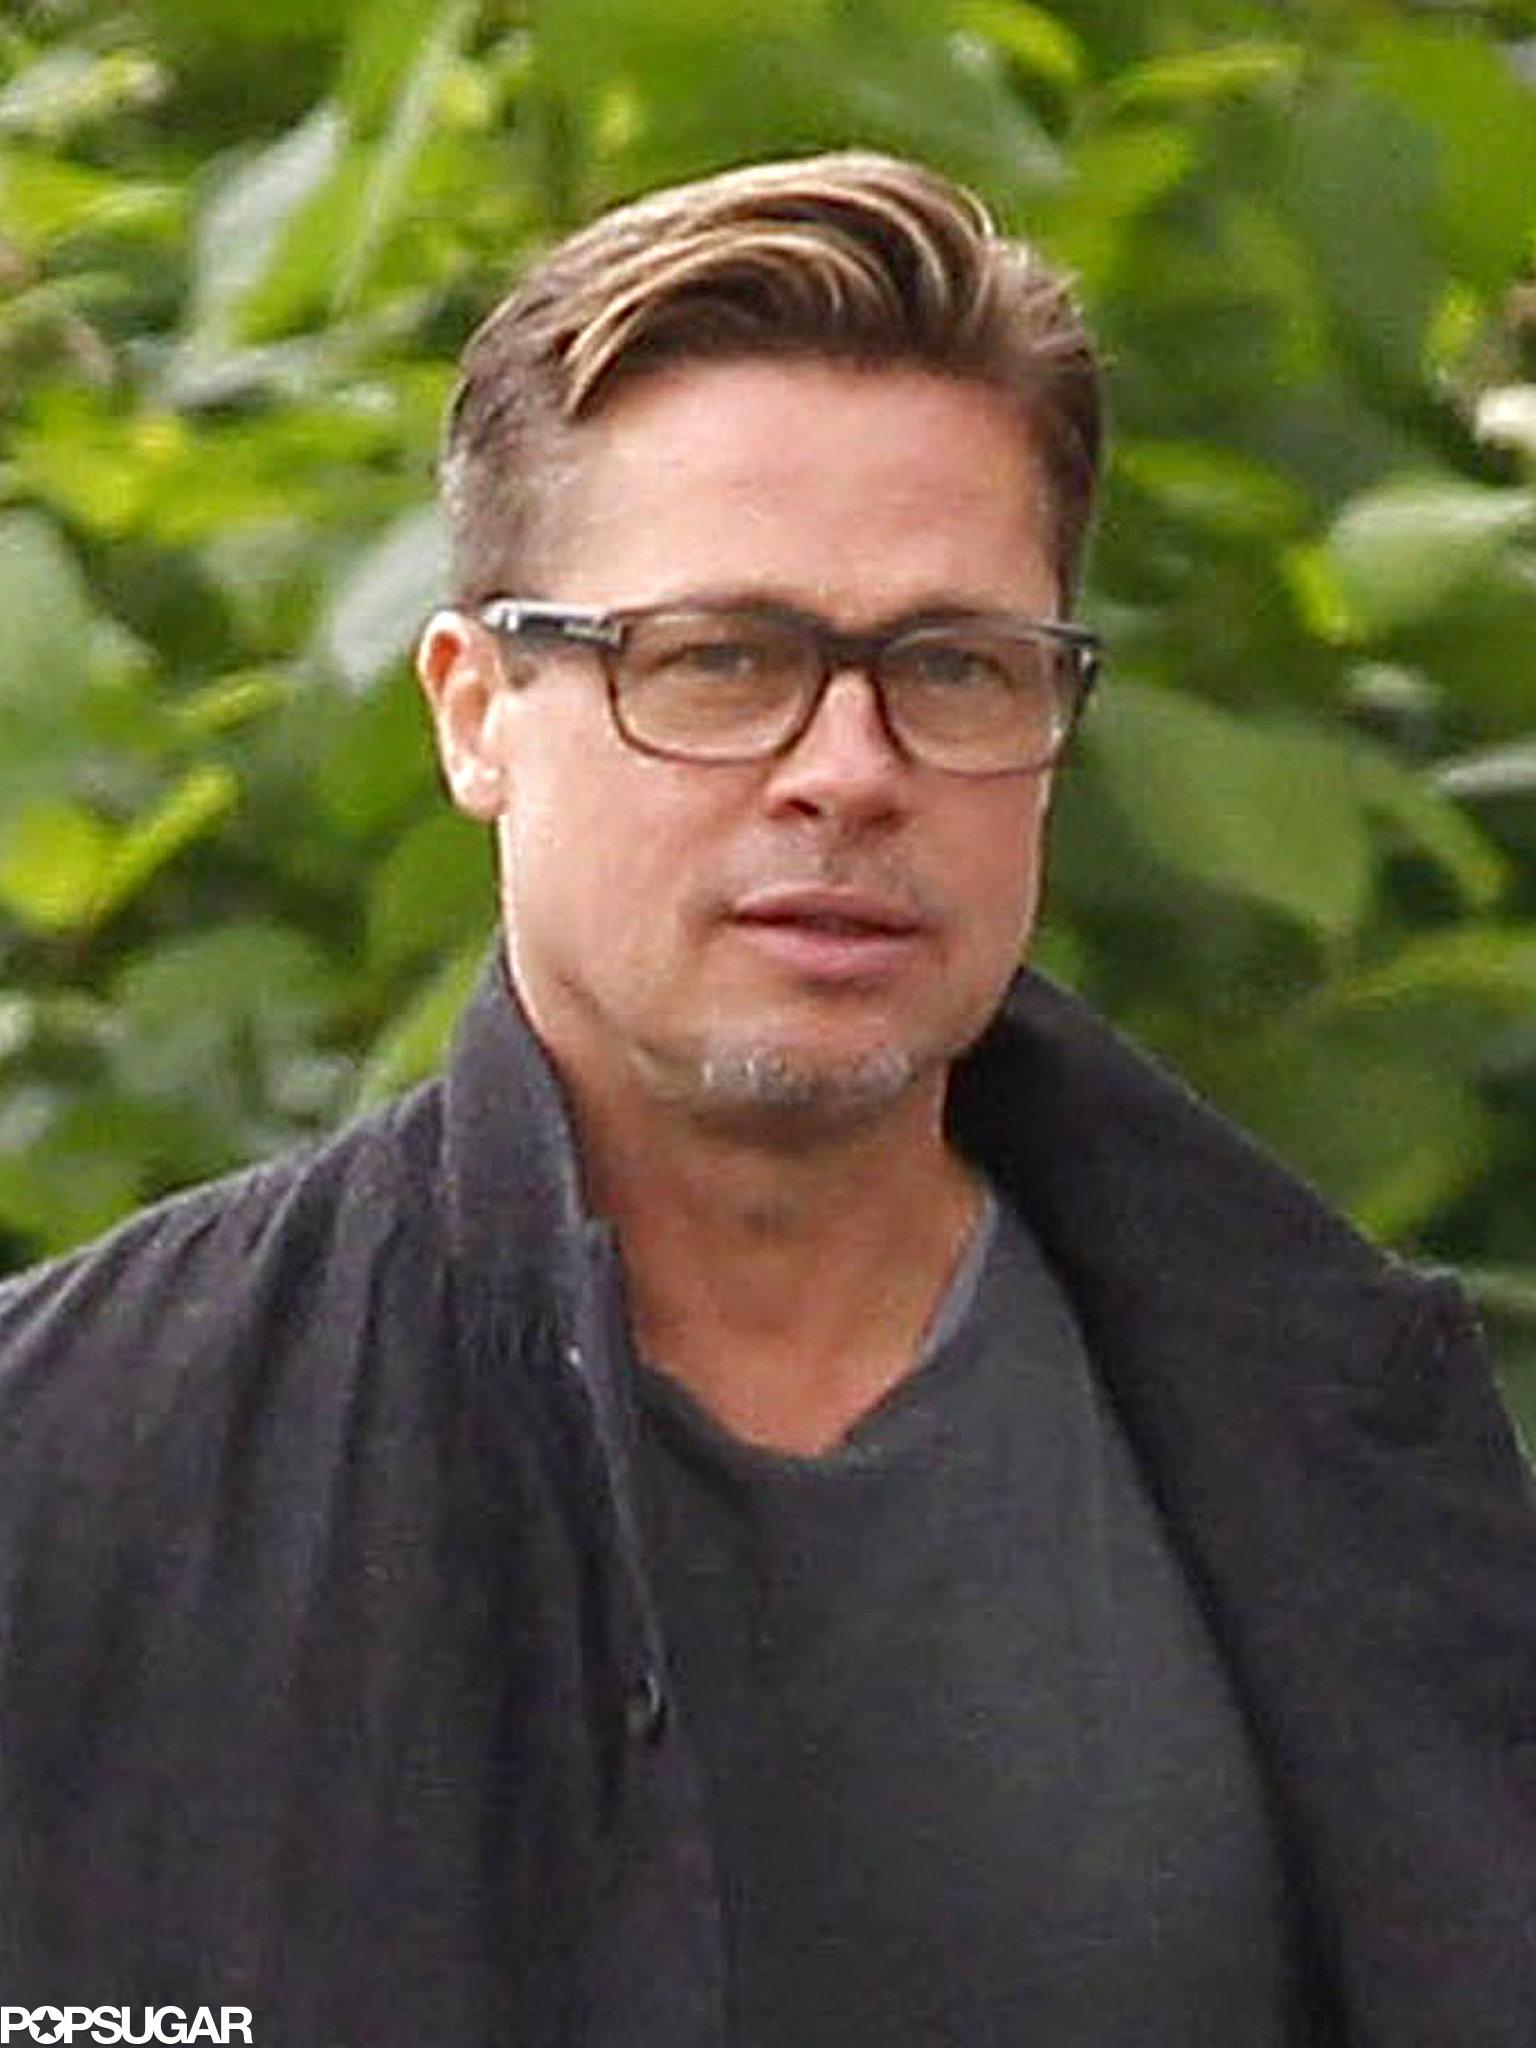 Brad Pitt showed off his short hair in London.